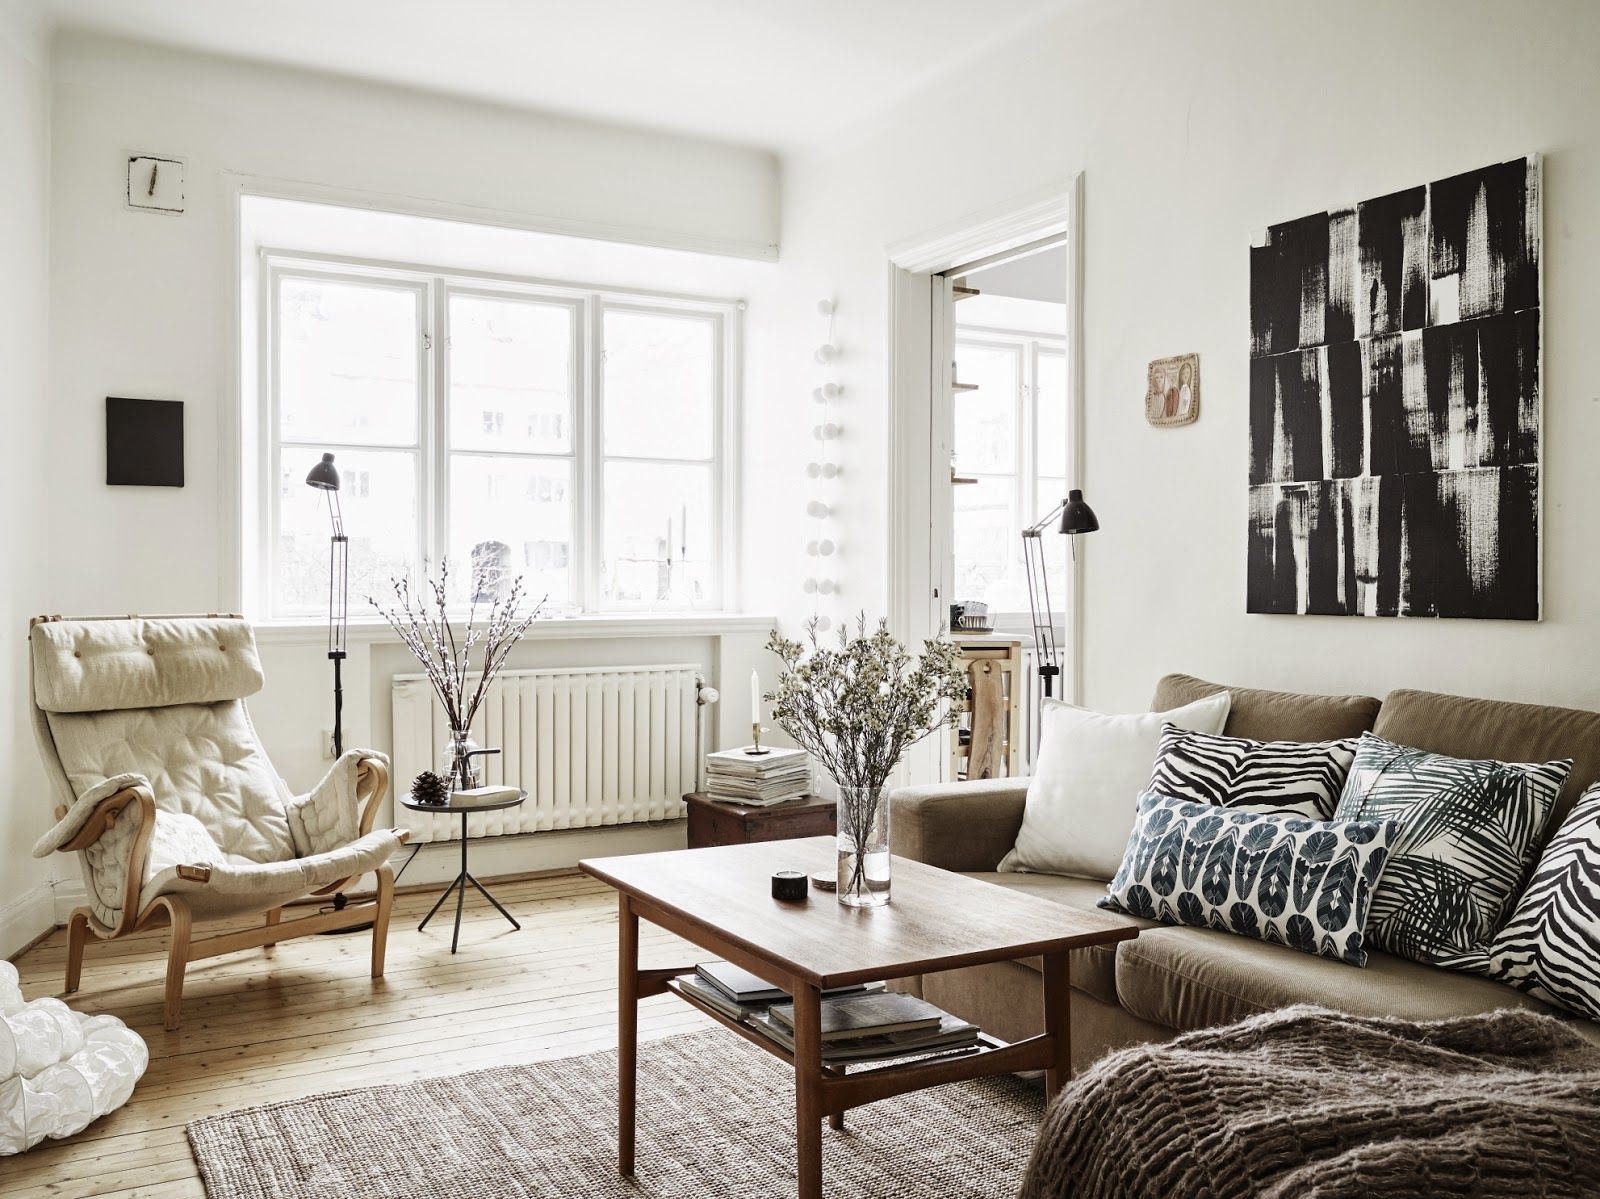 Silverkällan 1,Bright And Charming Swedish Apartment